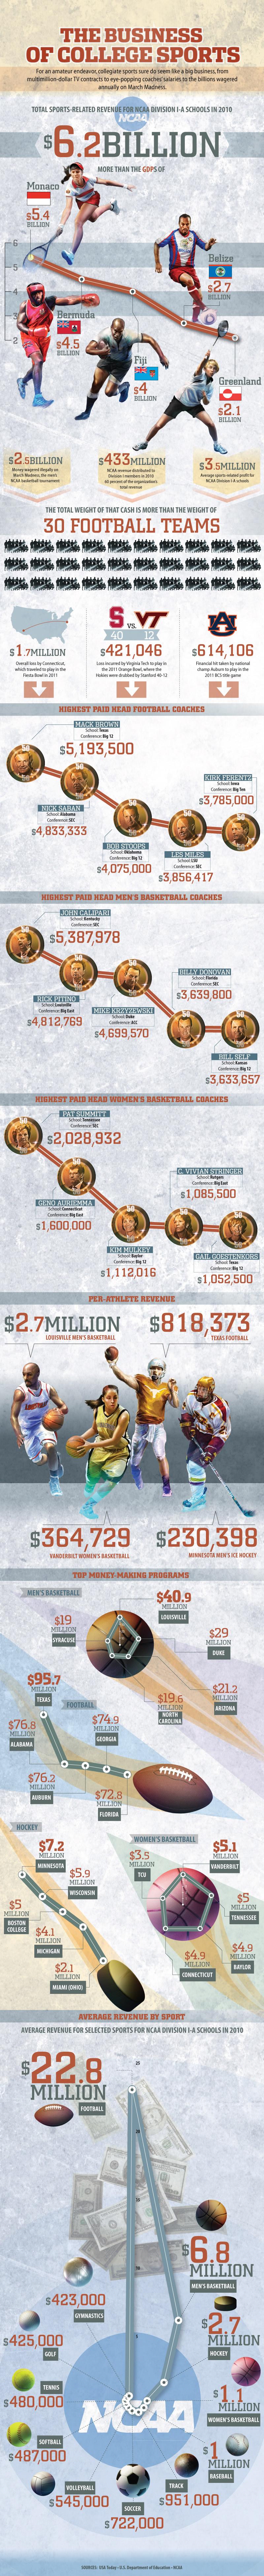 Global College Sports Statistics